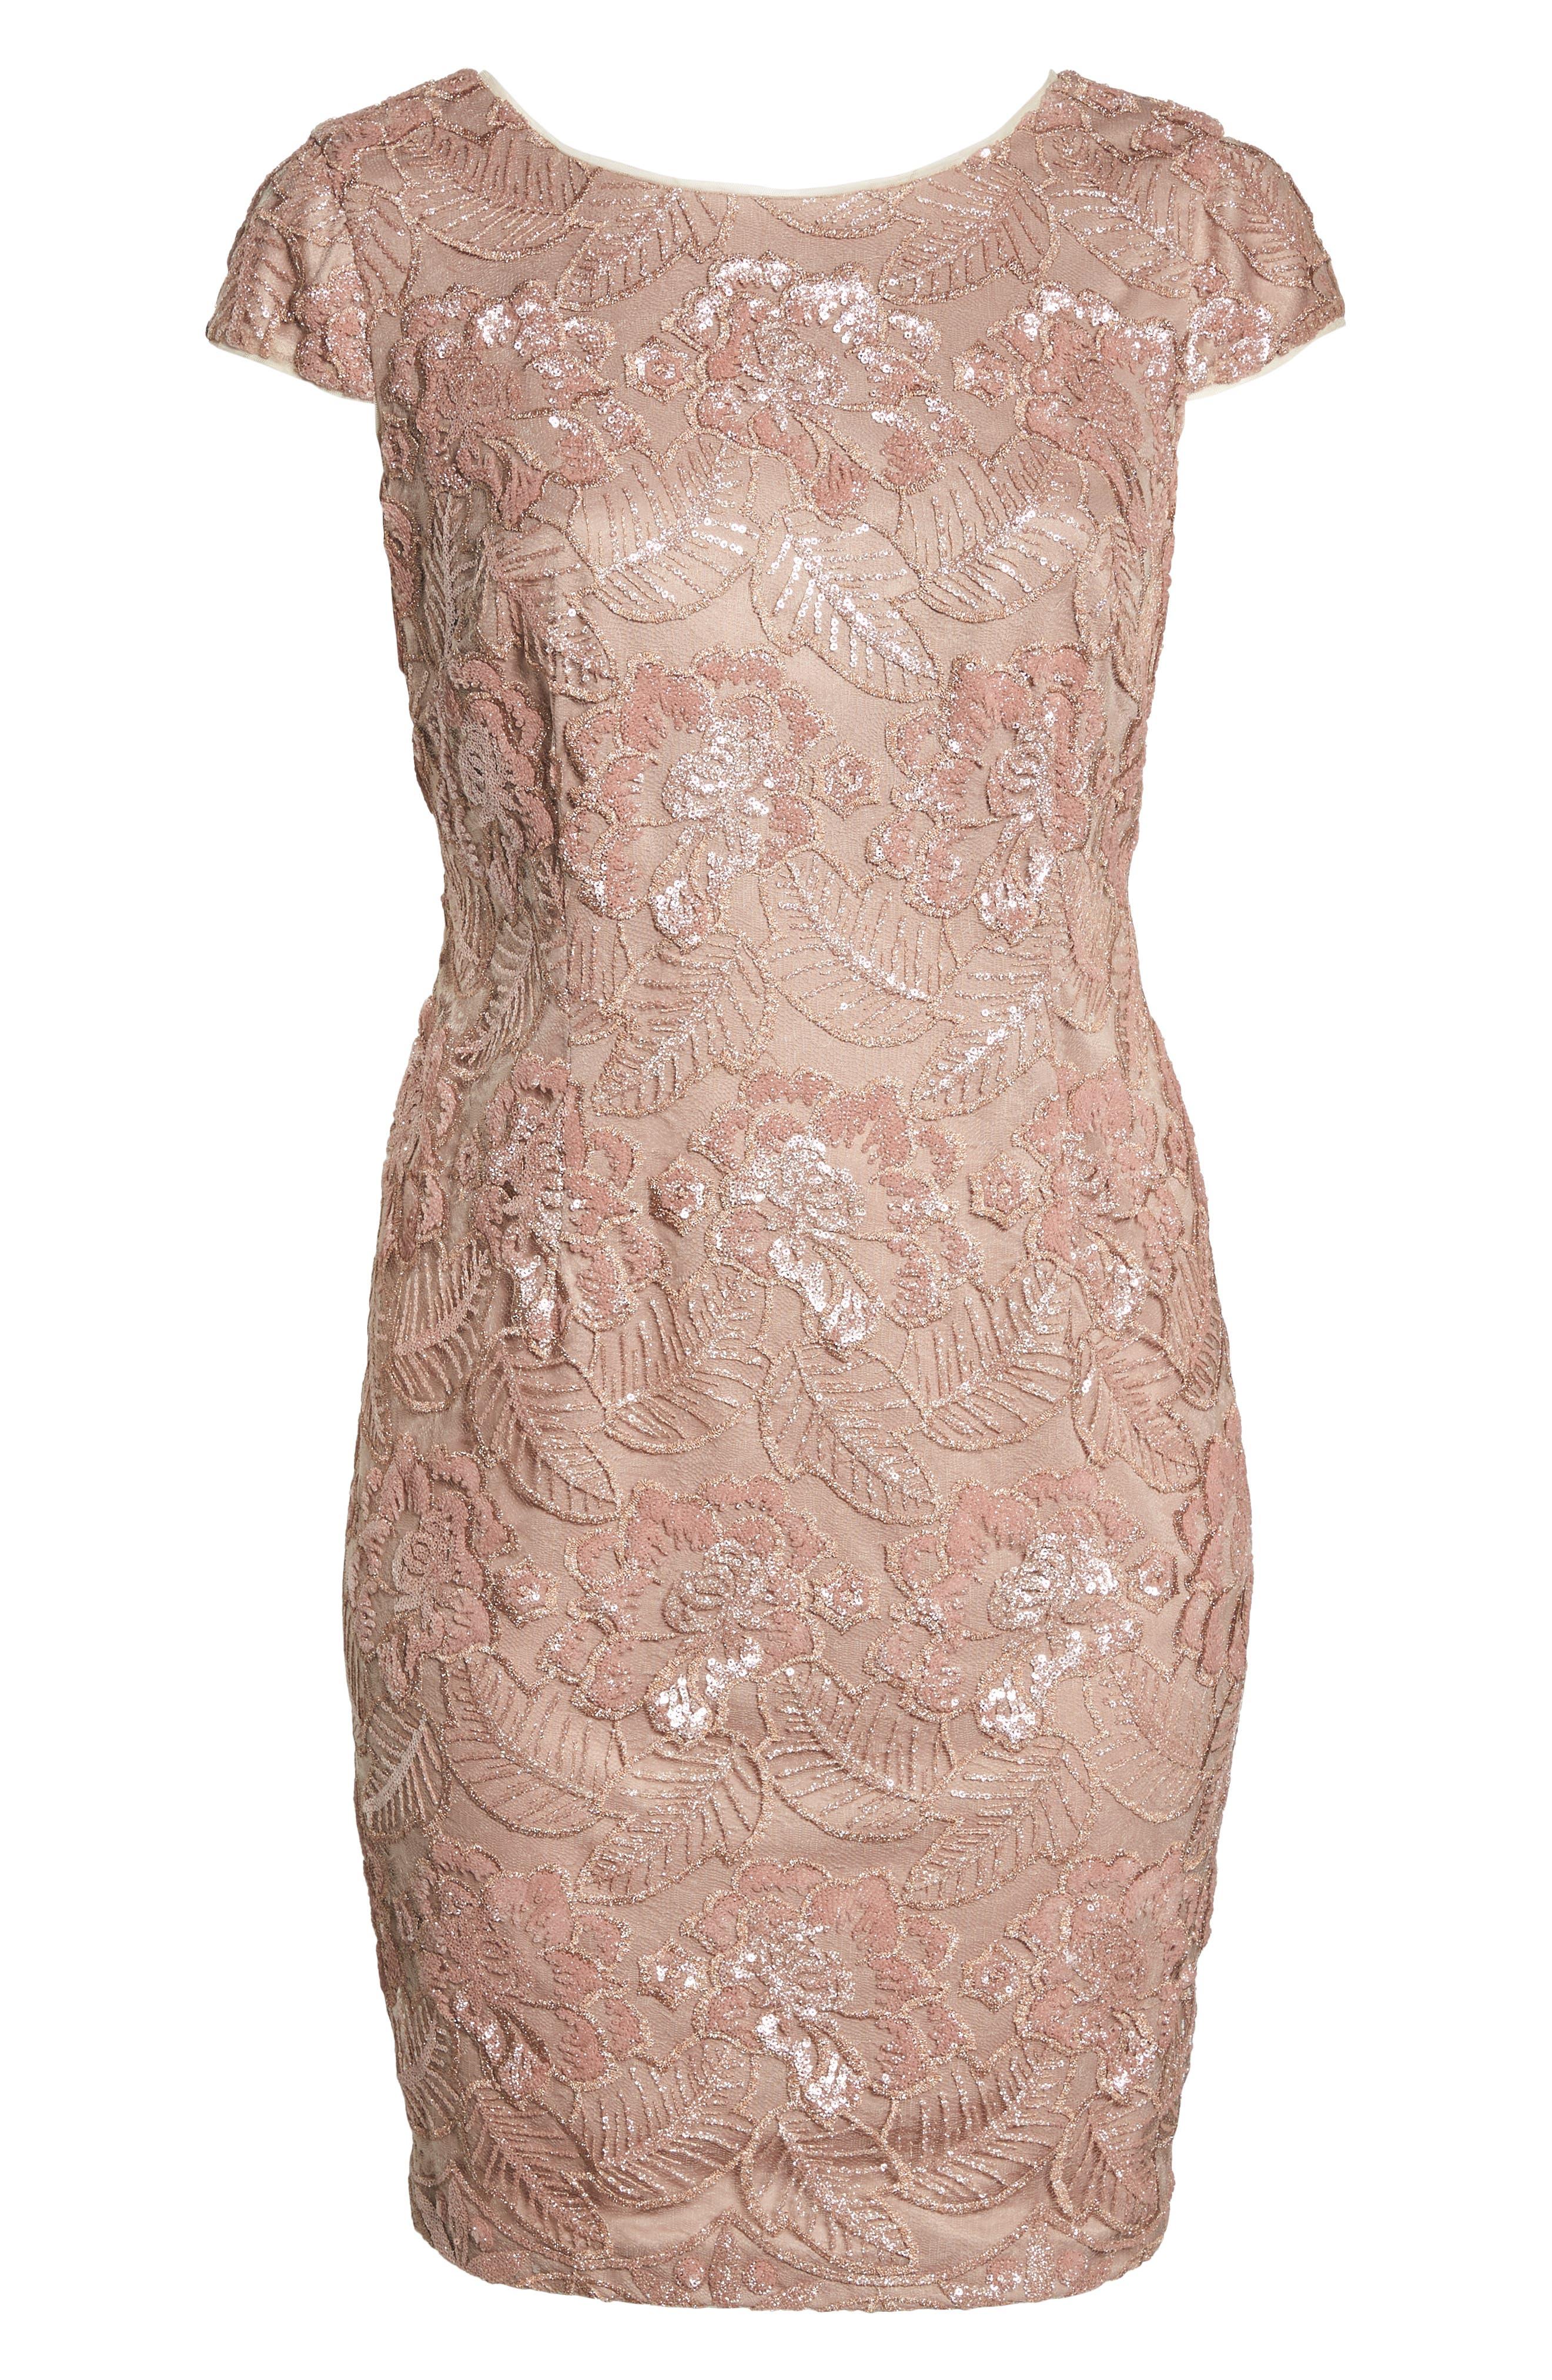 Sequin Lace Cocktail Dress,                             Alternate thumbnail 7, color,                             ROSE GOLD